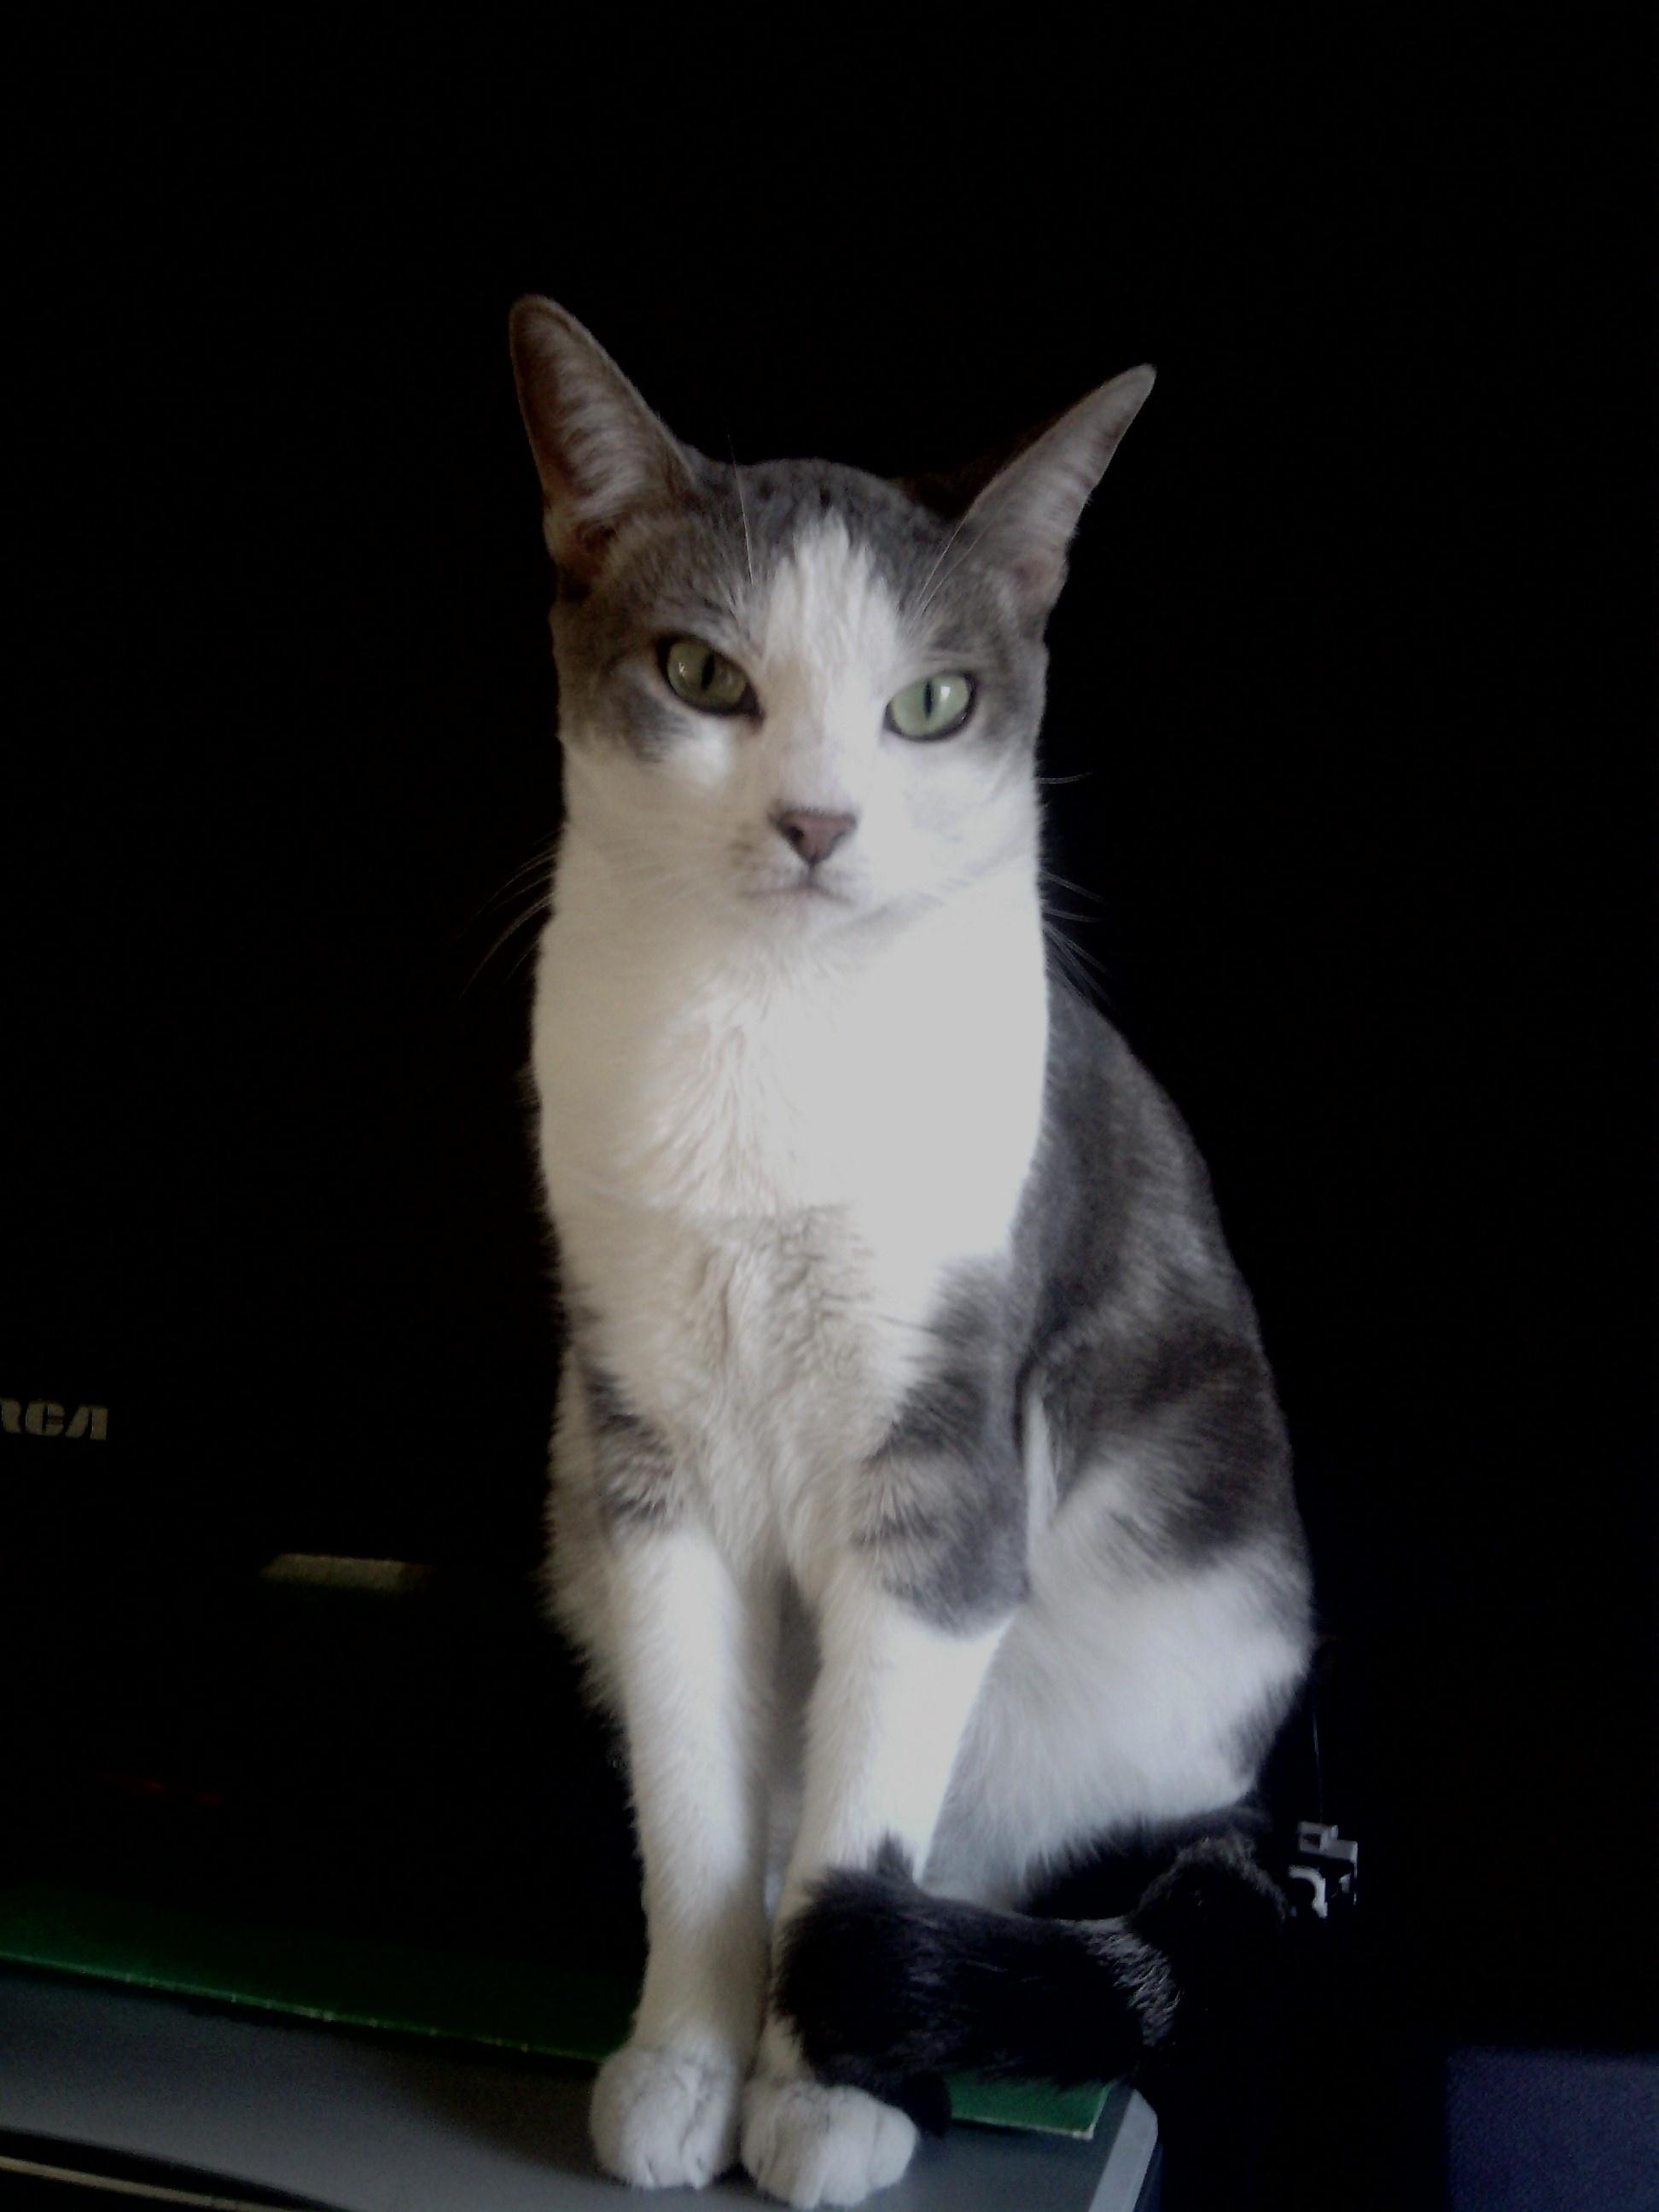 Carolina: Craigslist Kittens For Sale